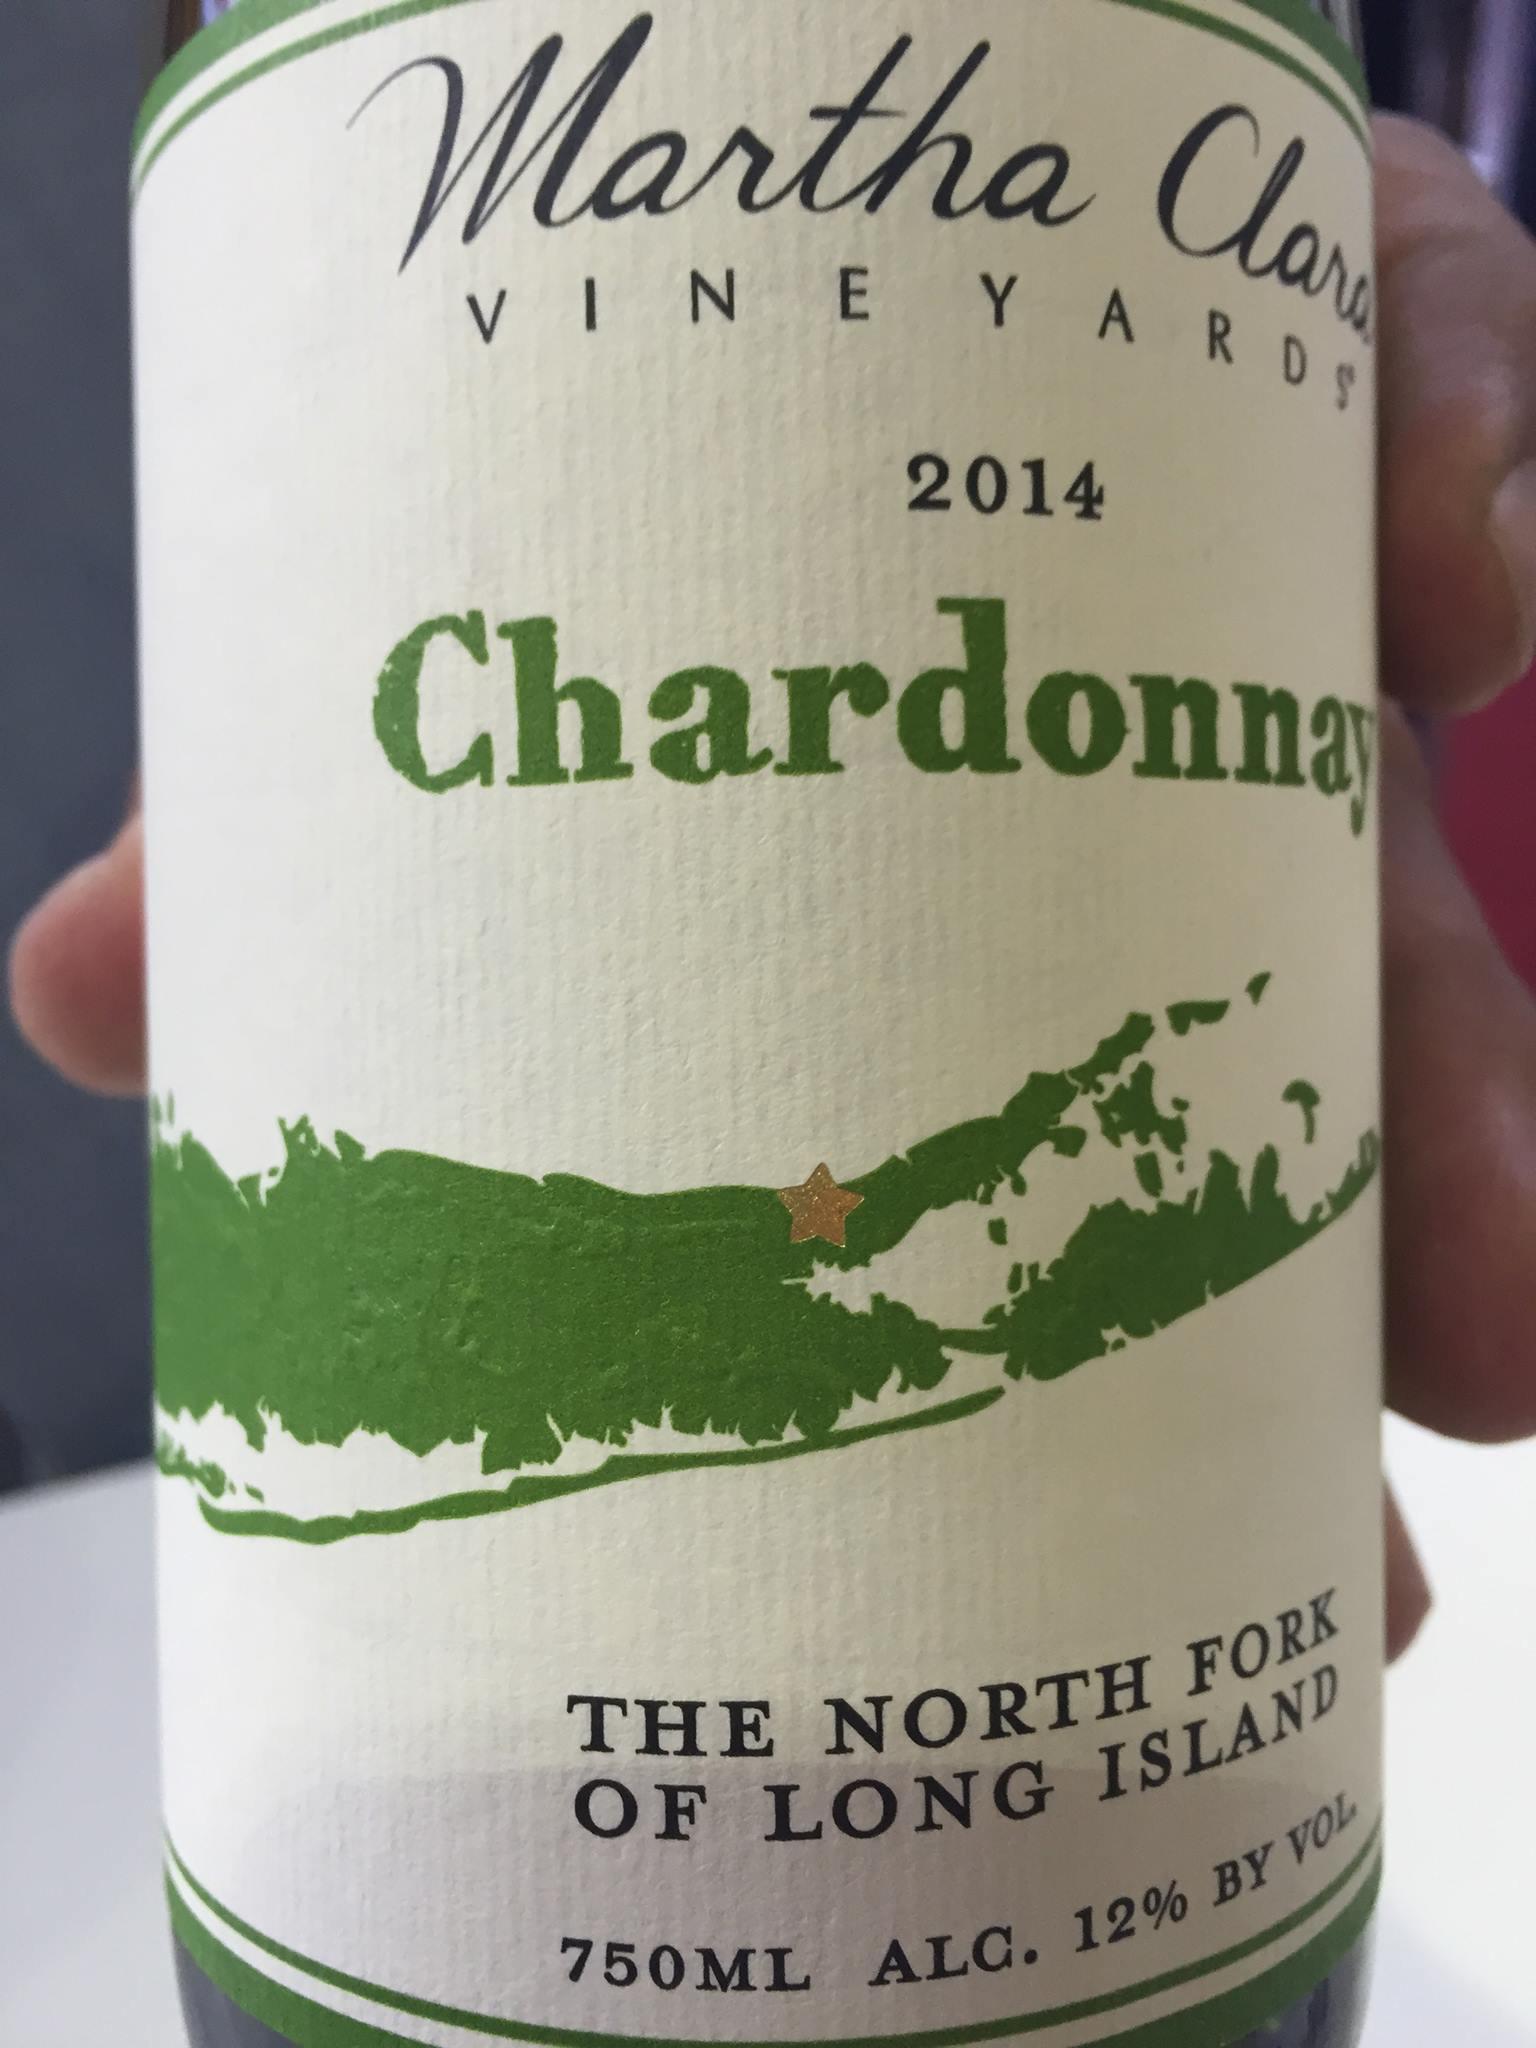 Martha Clara Vineyards – Chardonnay 2014 – The North Fork of Long Island